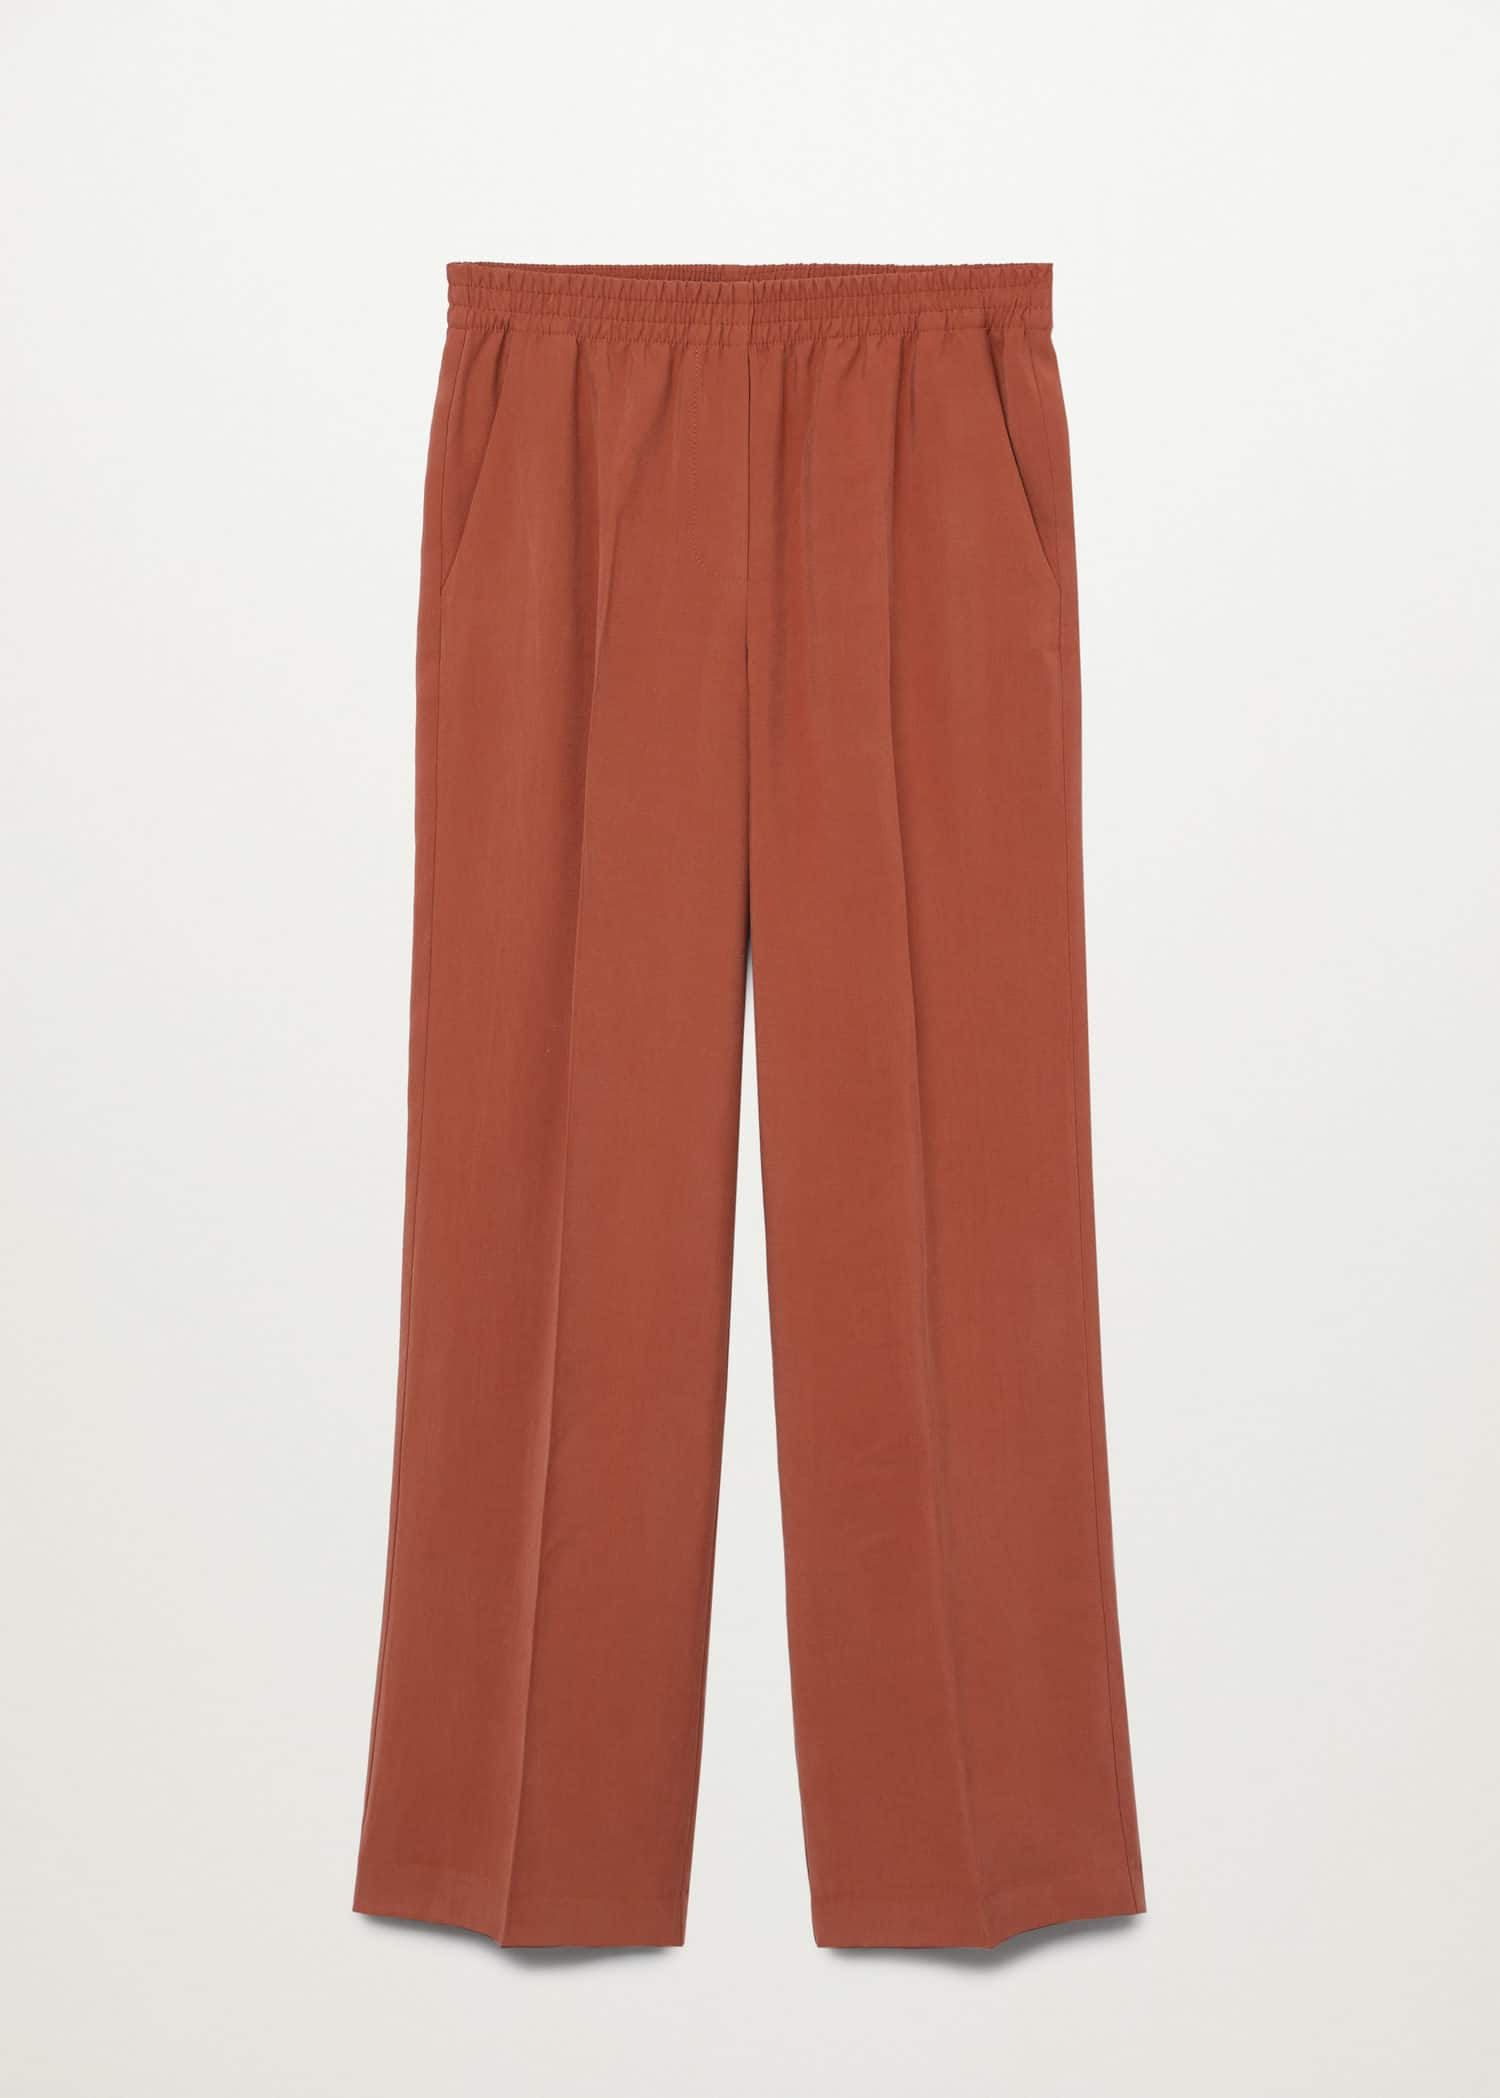 New Mango Rouge Dentelle Culotte Knickers Pantalon Rouge Taille L SE55